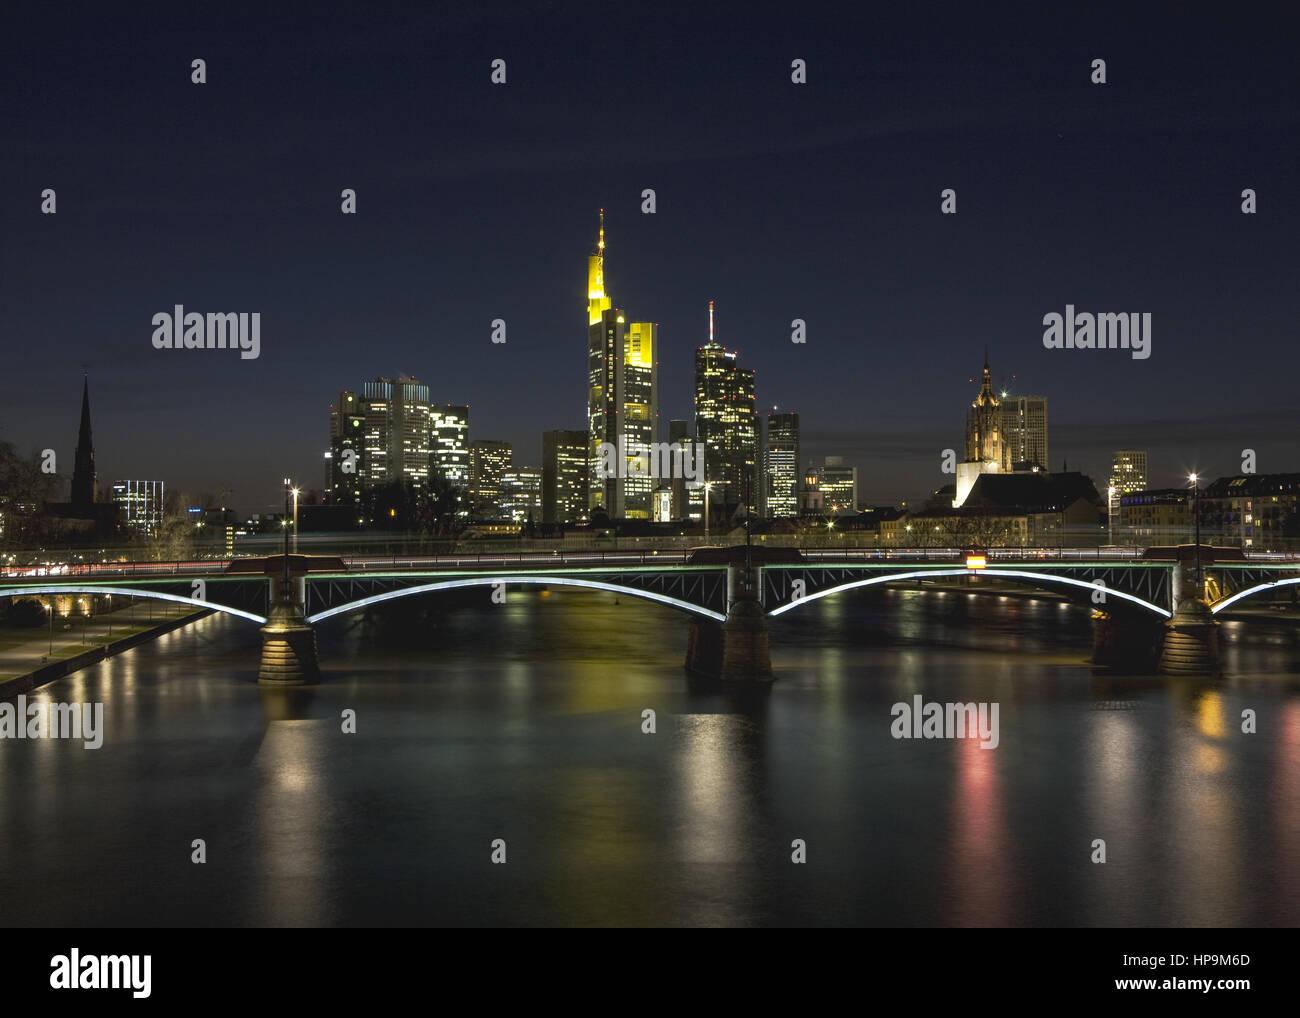 Frankfurt am Main, Bankenviertel, Skyline, abends - Stock Image